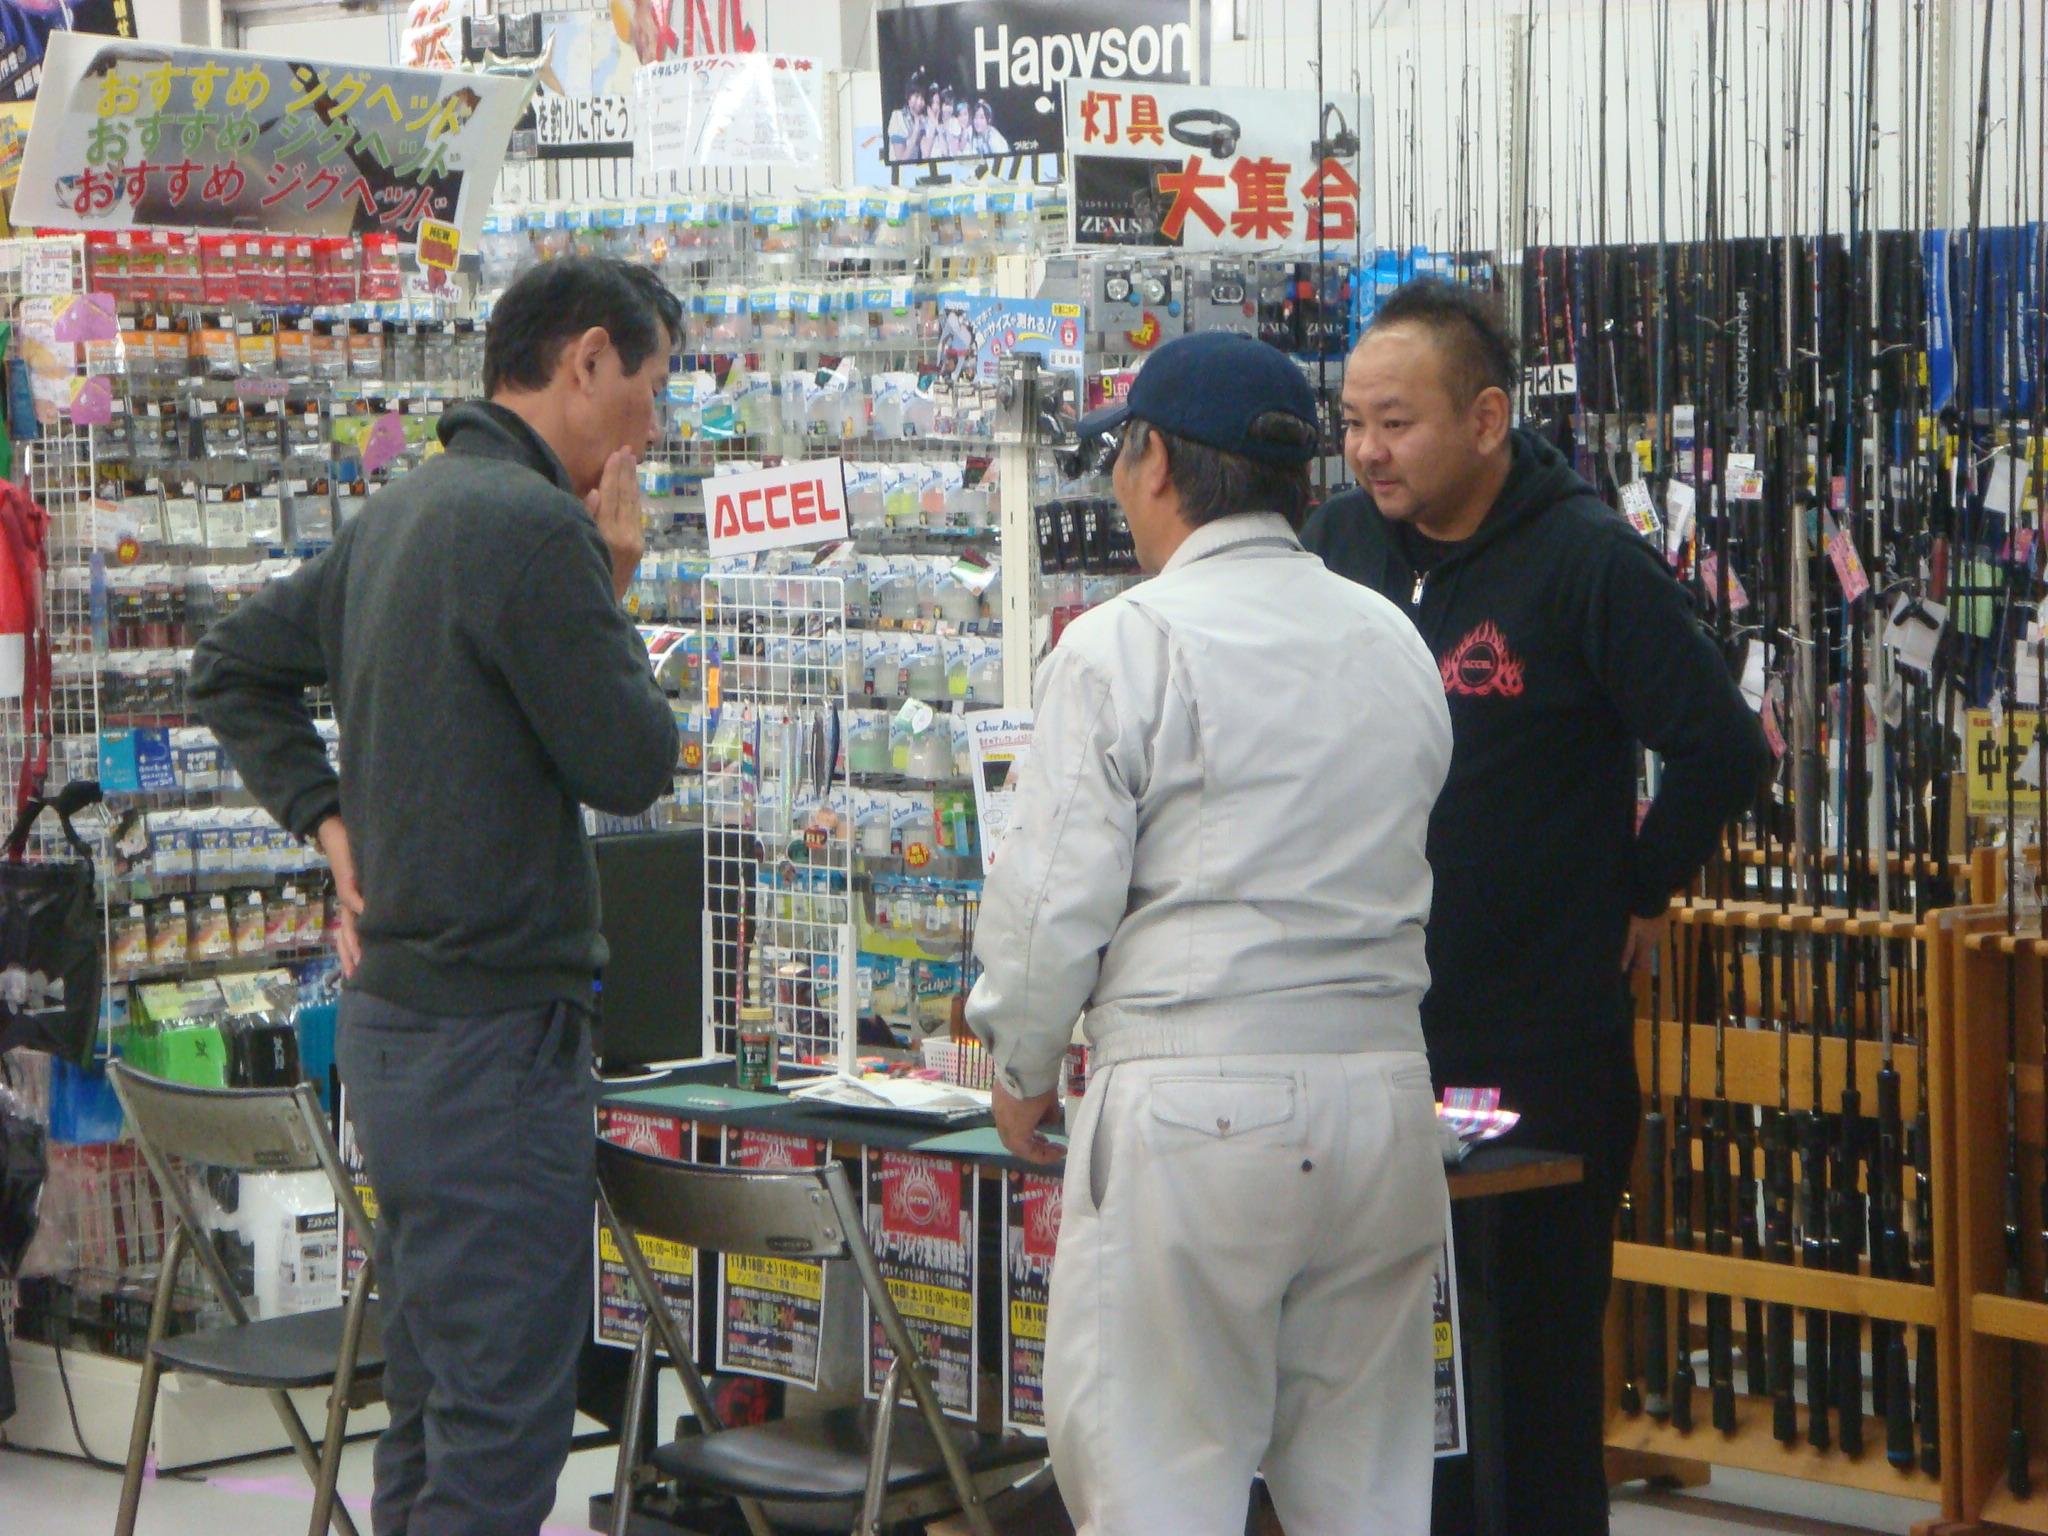 http://www.e-angle.co.jp/shop/news/DSC02507.JPG